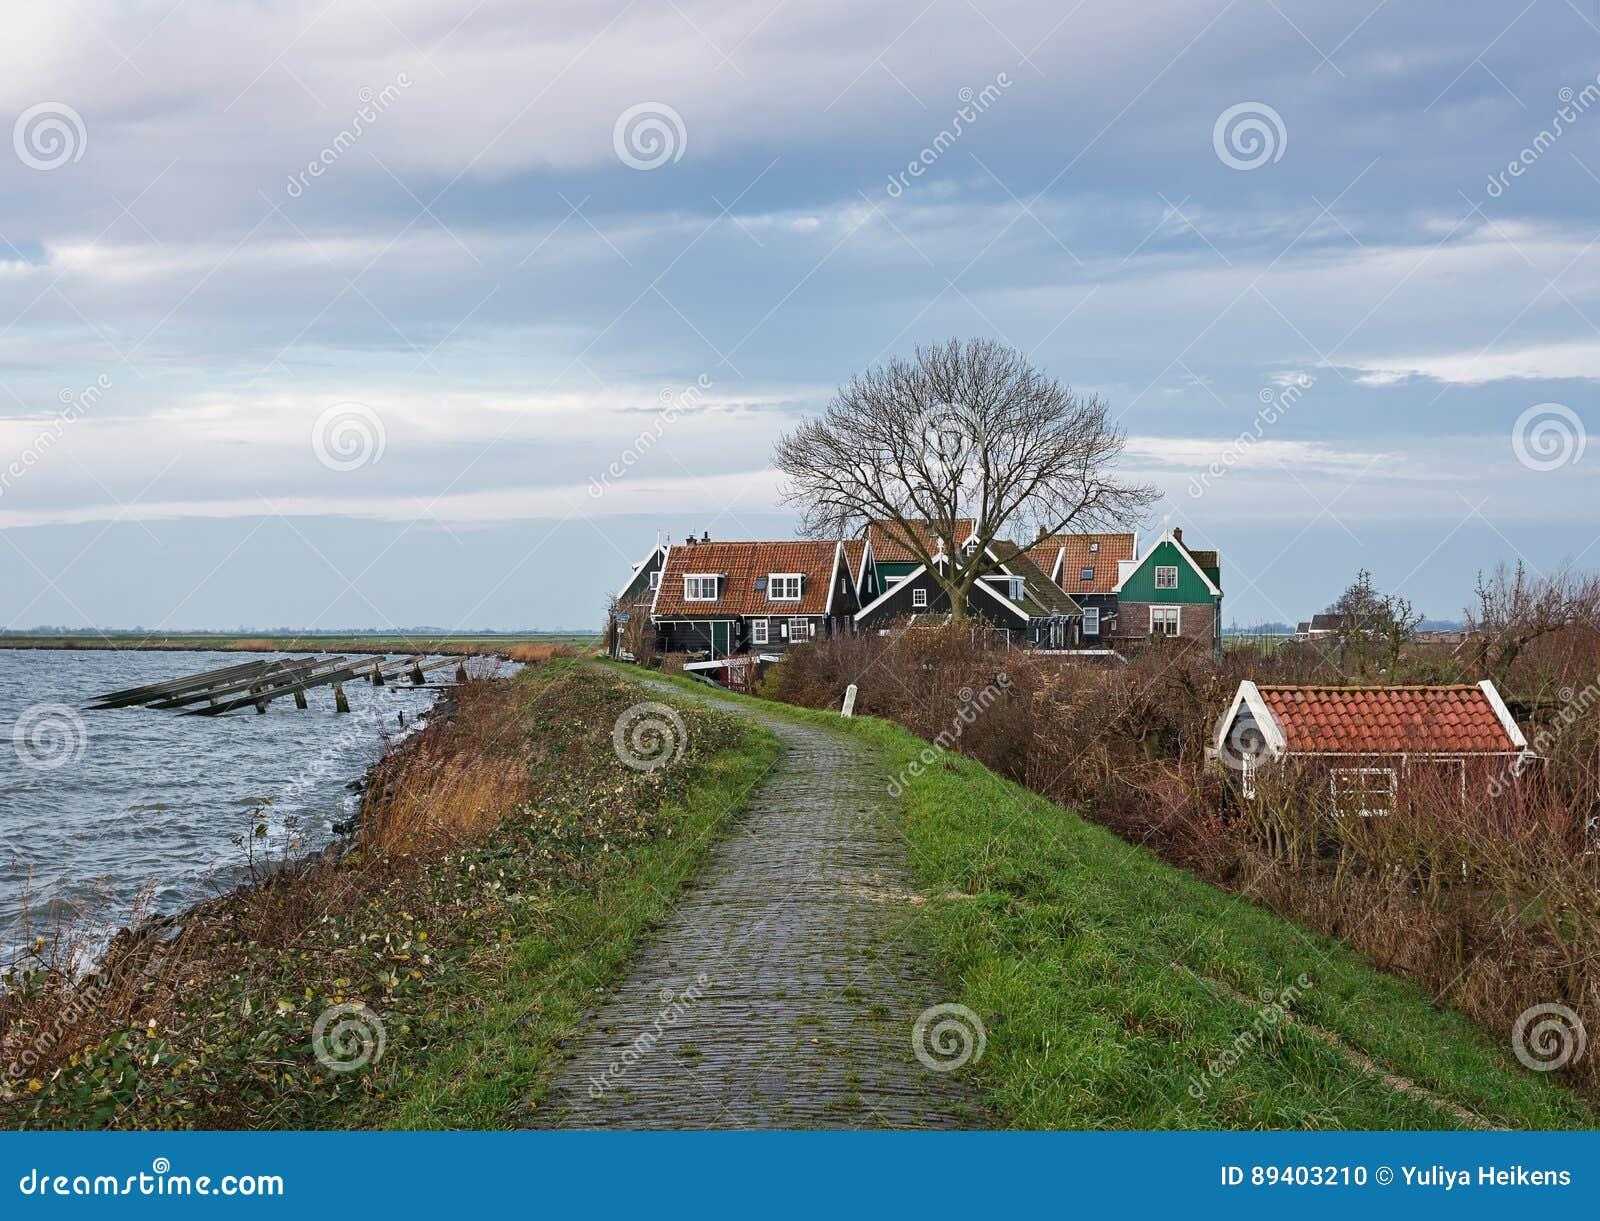 Olhe uma aldeola na ilha Marken, Países Baixos